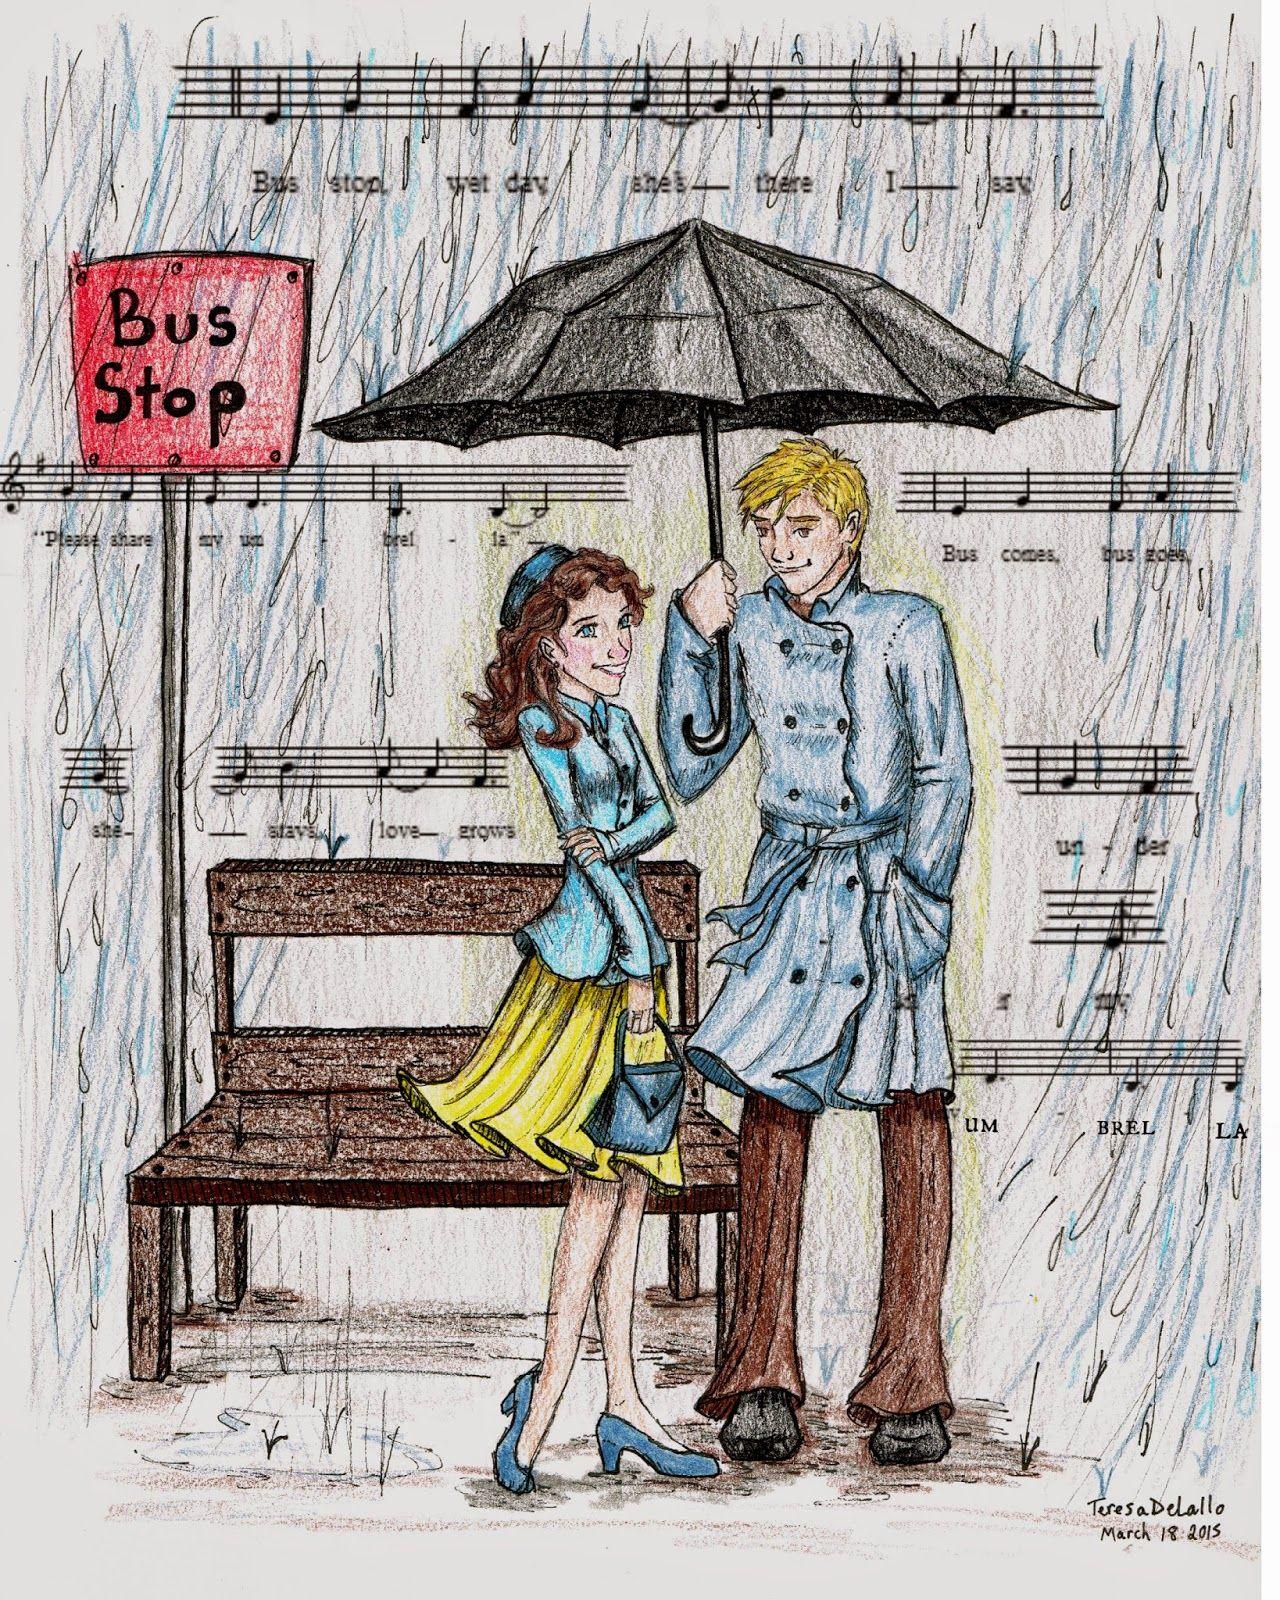 Bus stop the hollies couple drawings bus stop couple art umbrellas pencil